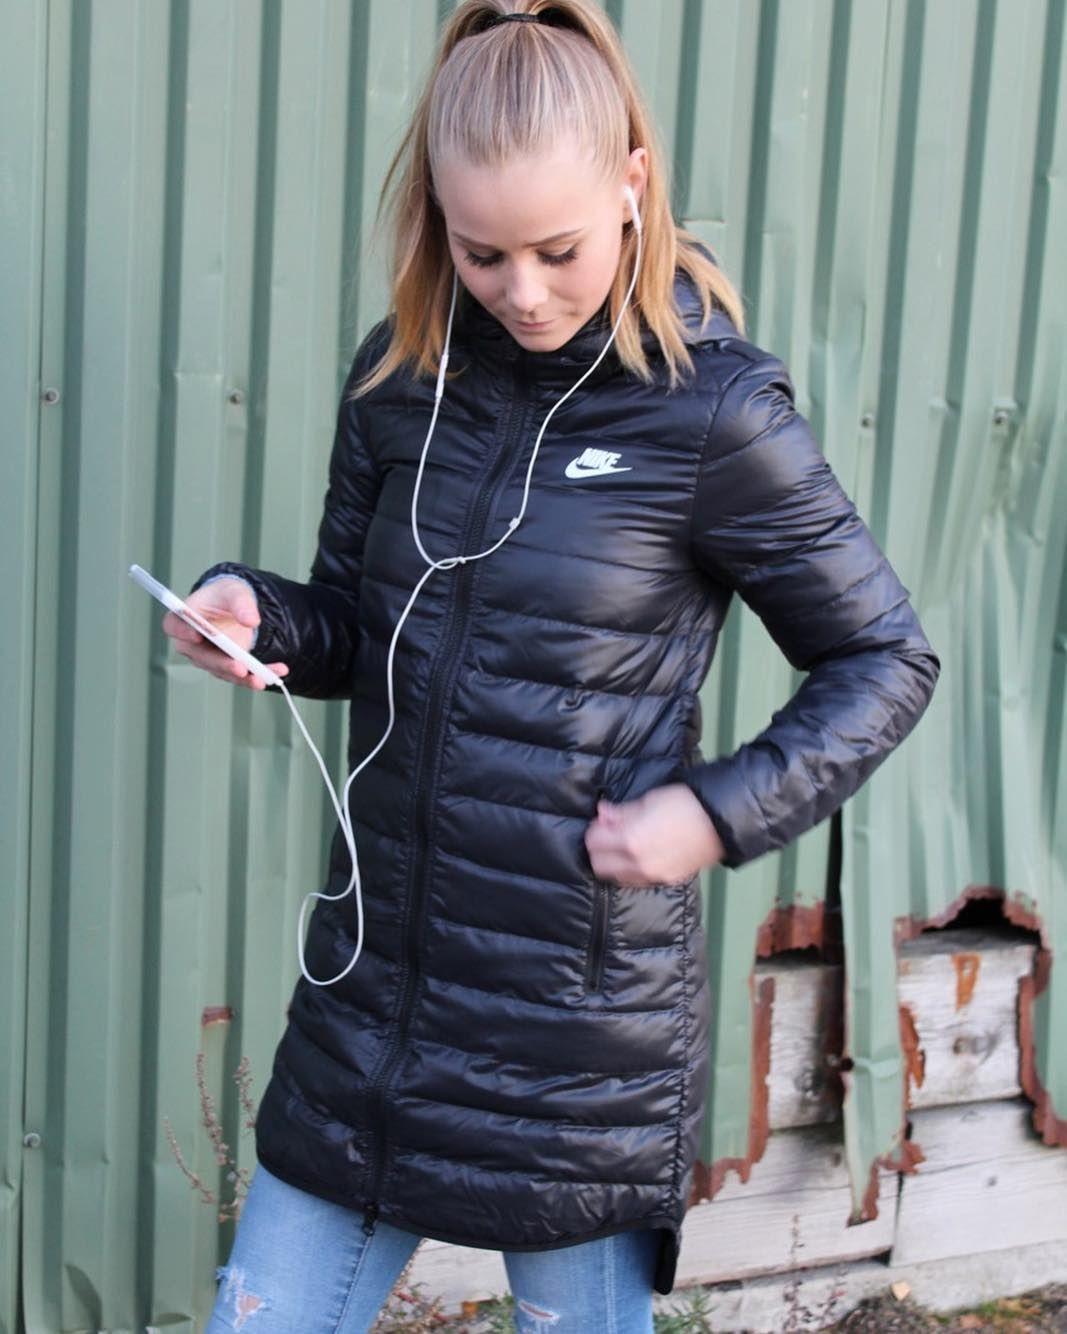 635da710 Nike Downfall Parka ❤ #nike #nyheter #downparka / 1450,- på ...